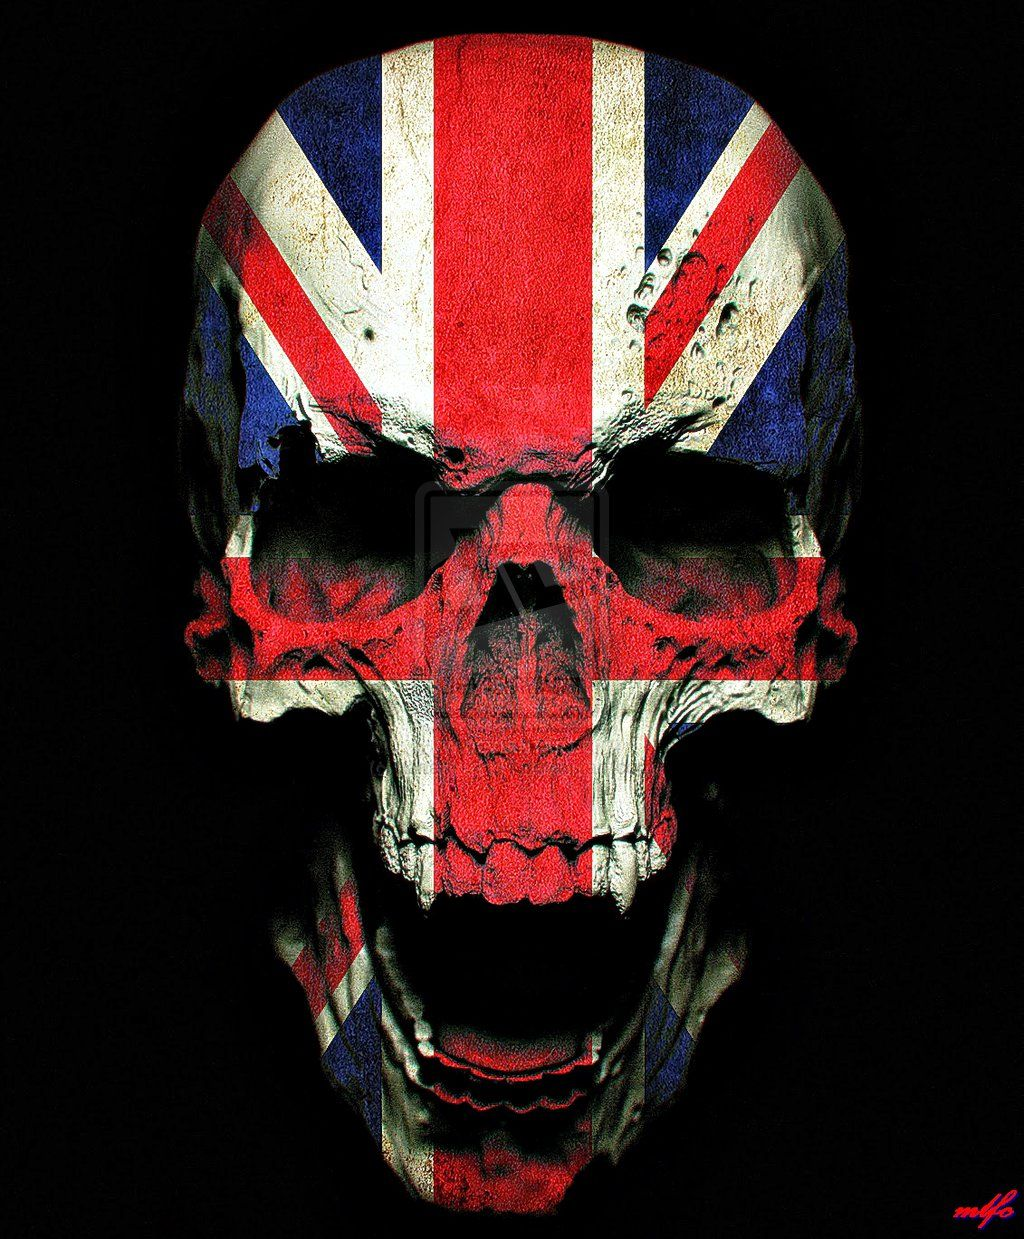 Union Jack Iphone Wallpaper The Royal Skull By Kananka1111 Skulls In 2019 Skull